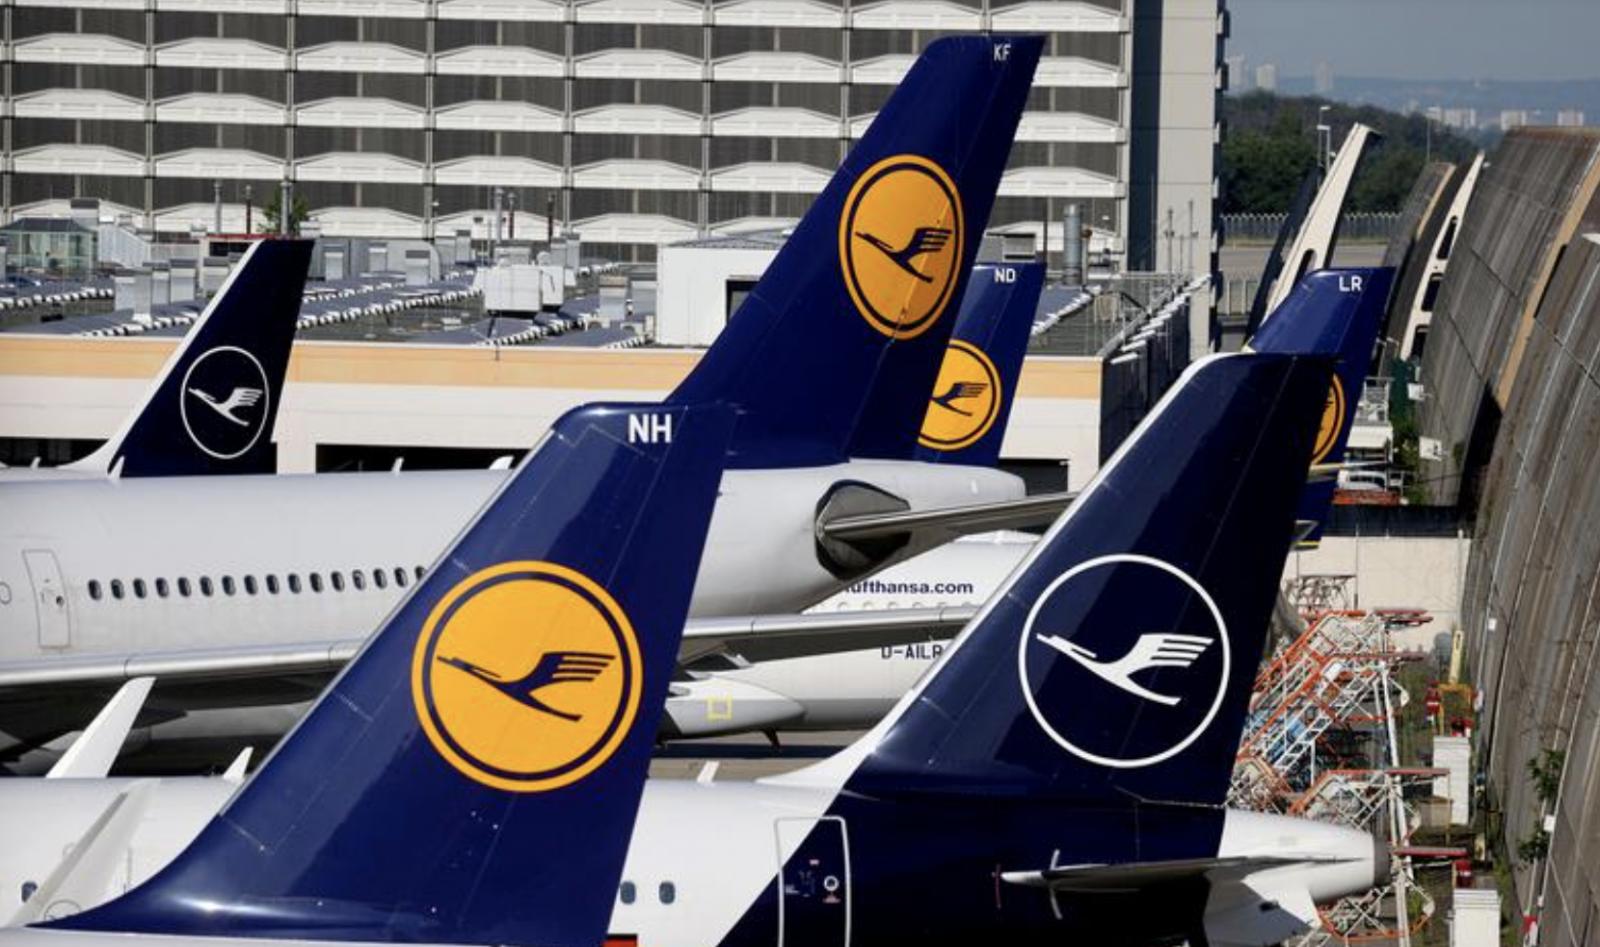 Lufthansa Sees Surge in Demand for Transatlantic, Europe Flights